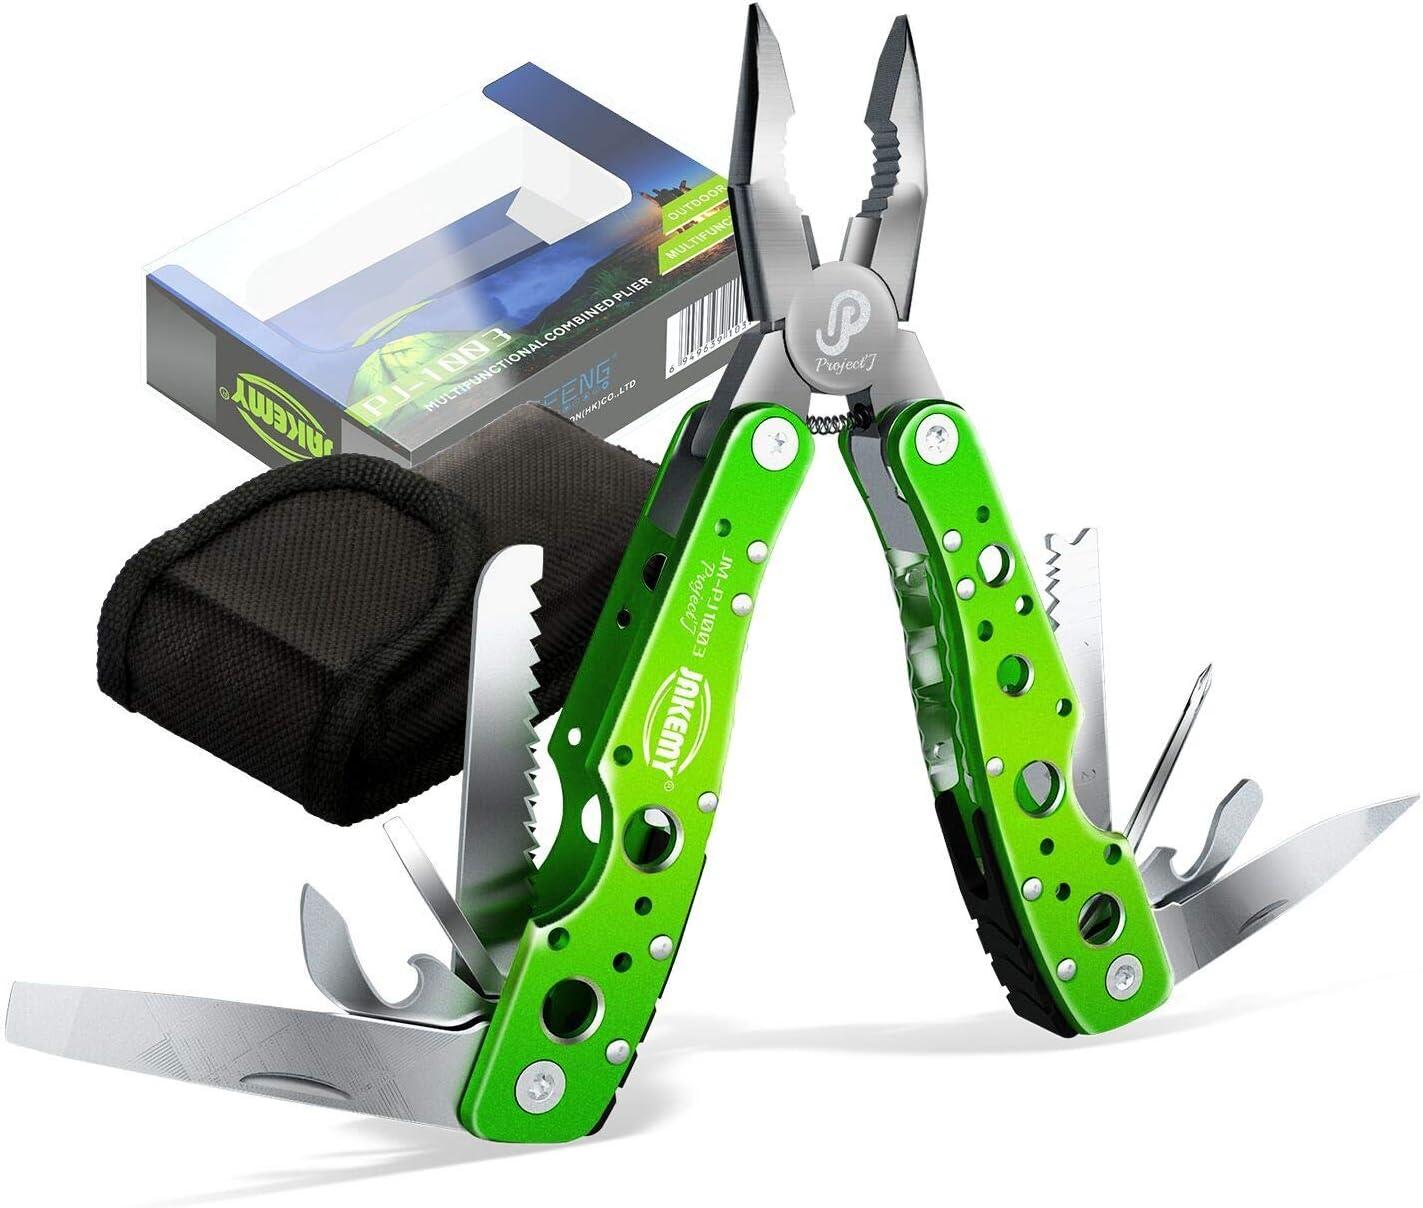 Mini Outdoor Camping Survival Folding Screwdriver Plier Pocket Cutter Multi Tool